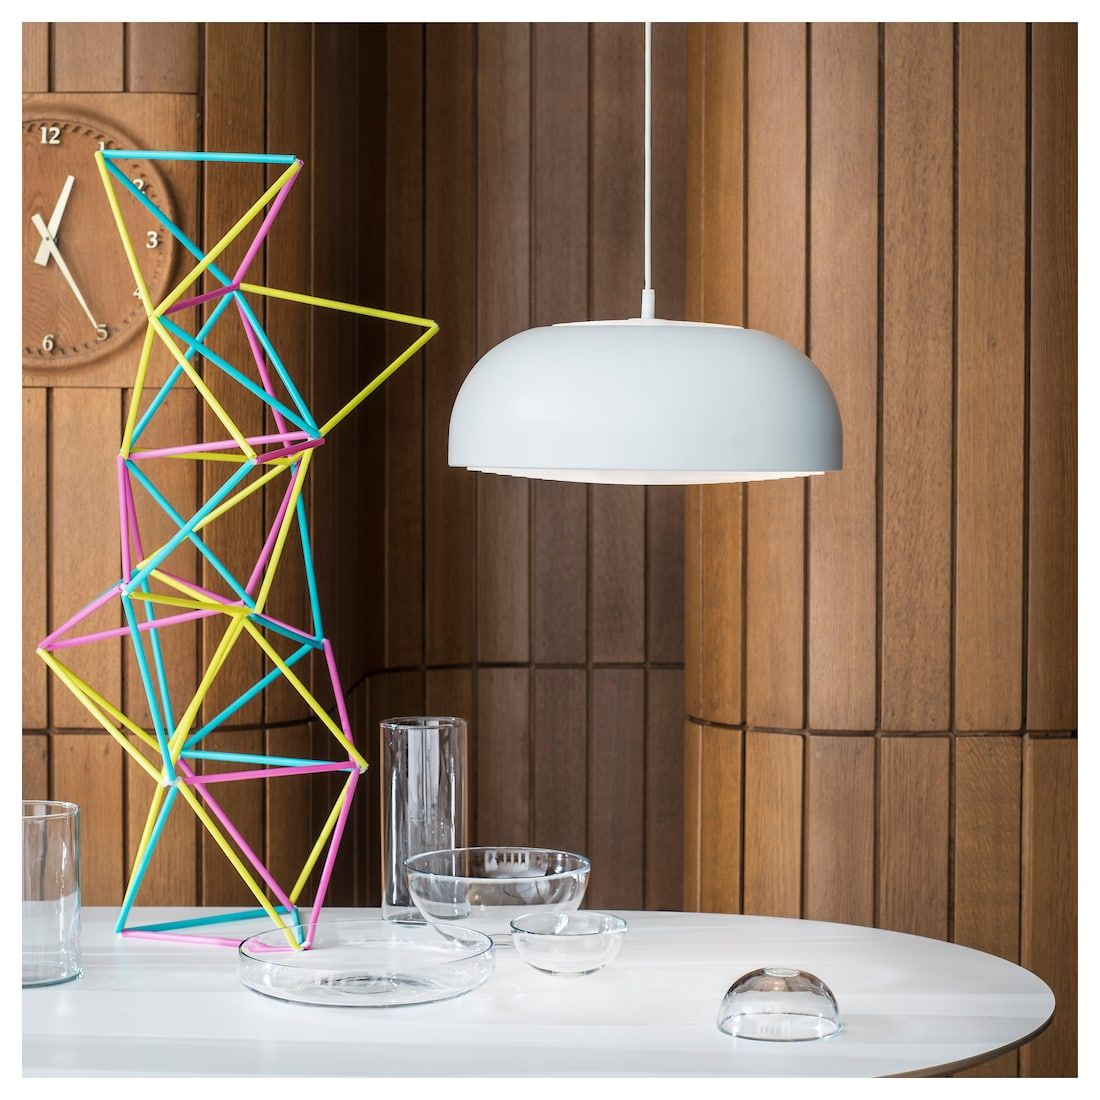 Nymane Pendant Lamp White Ikea White Pendant Lamp Pendant Lamp Lamp